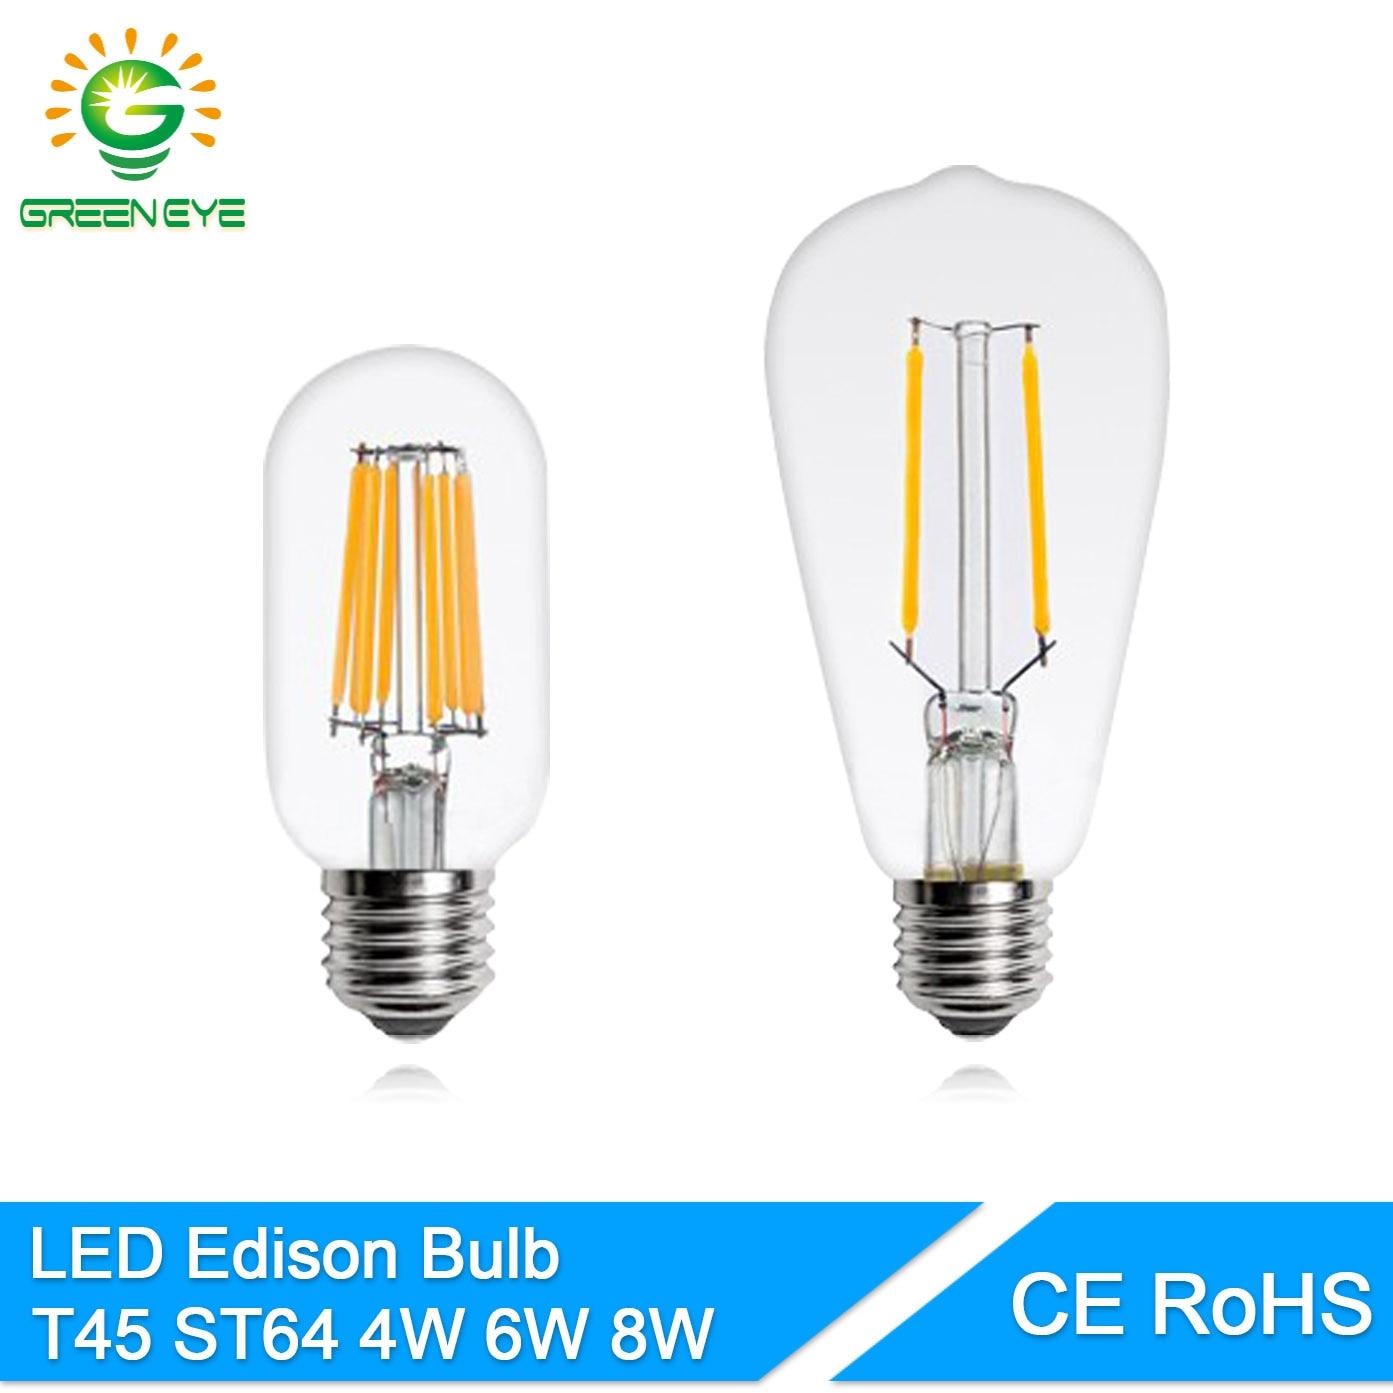 GreenEye Retro T45 ST64 Glass COB LED Edison Bulb E27 220V 4w 6w 8w LED Filament Lamp Ampoule Lampara Bombilla LED Bulb Edison